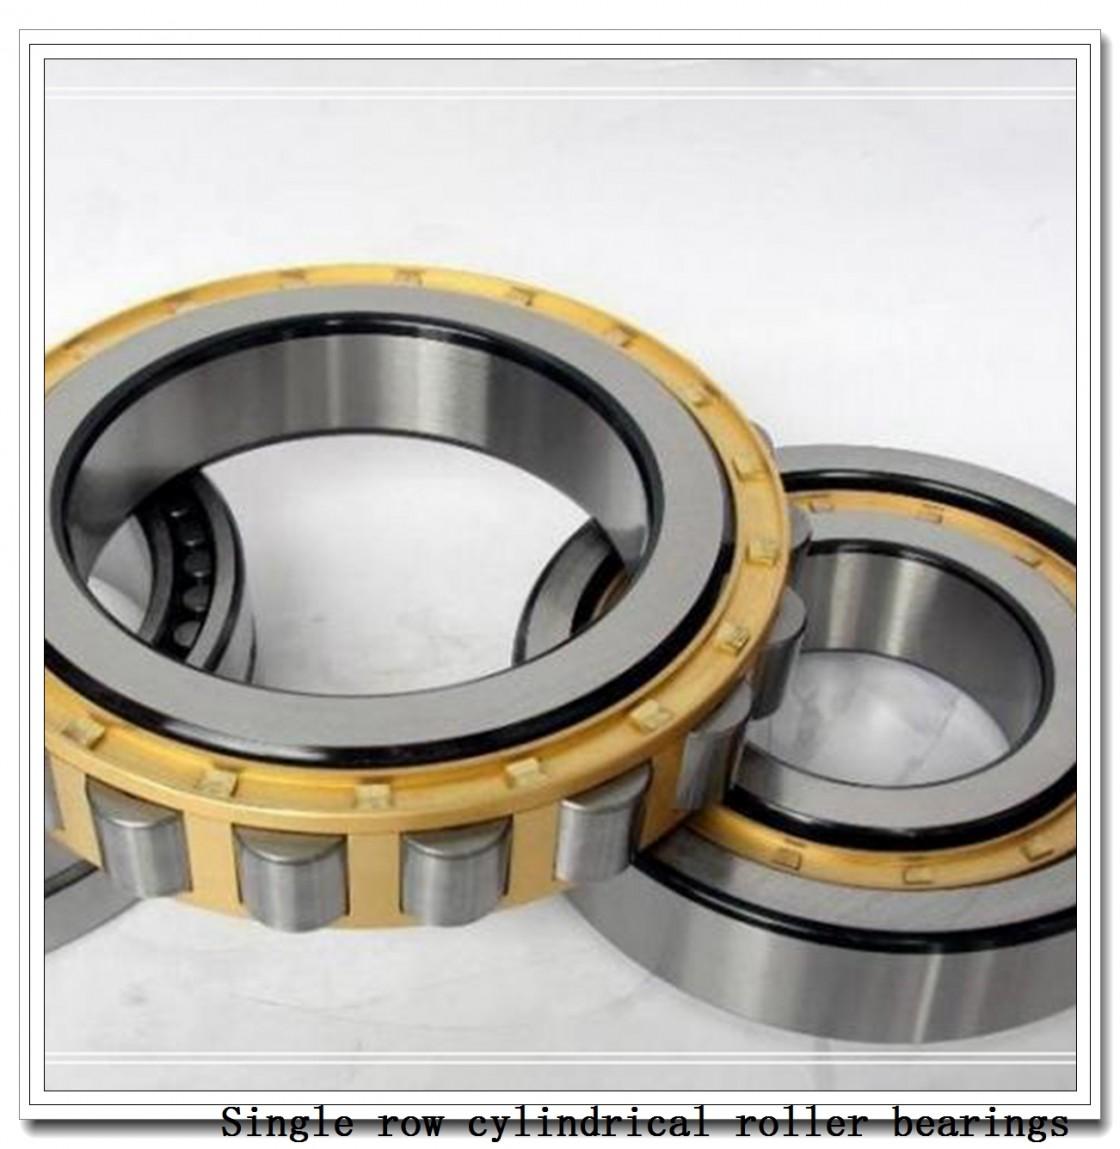 NJ424M Single row cylindrical roller bearings